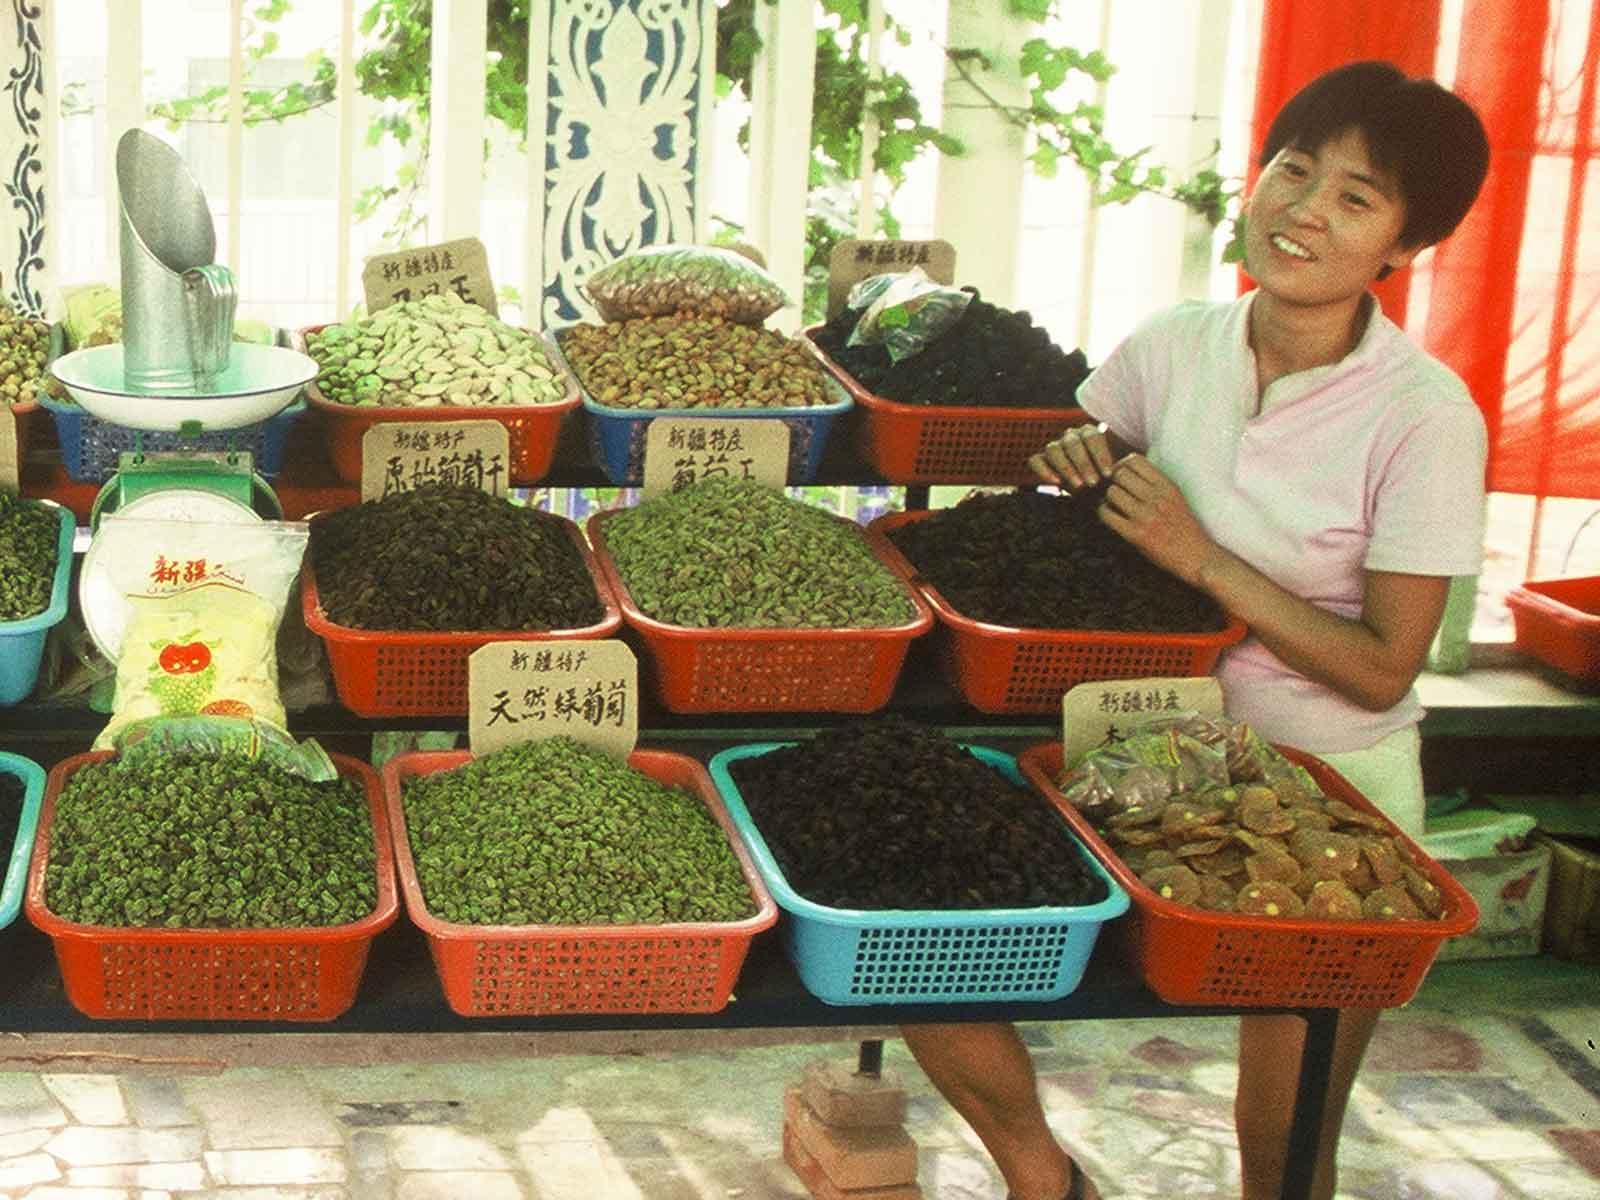 Turpan raisins - China Silk Road Photo Journal - Steven Andrew Martin - Eastern Civilization